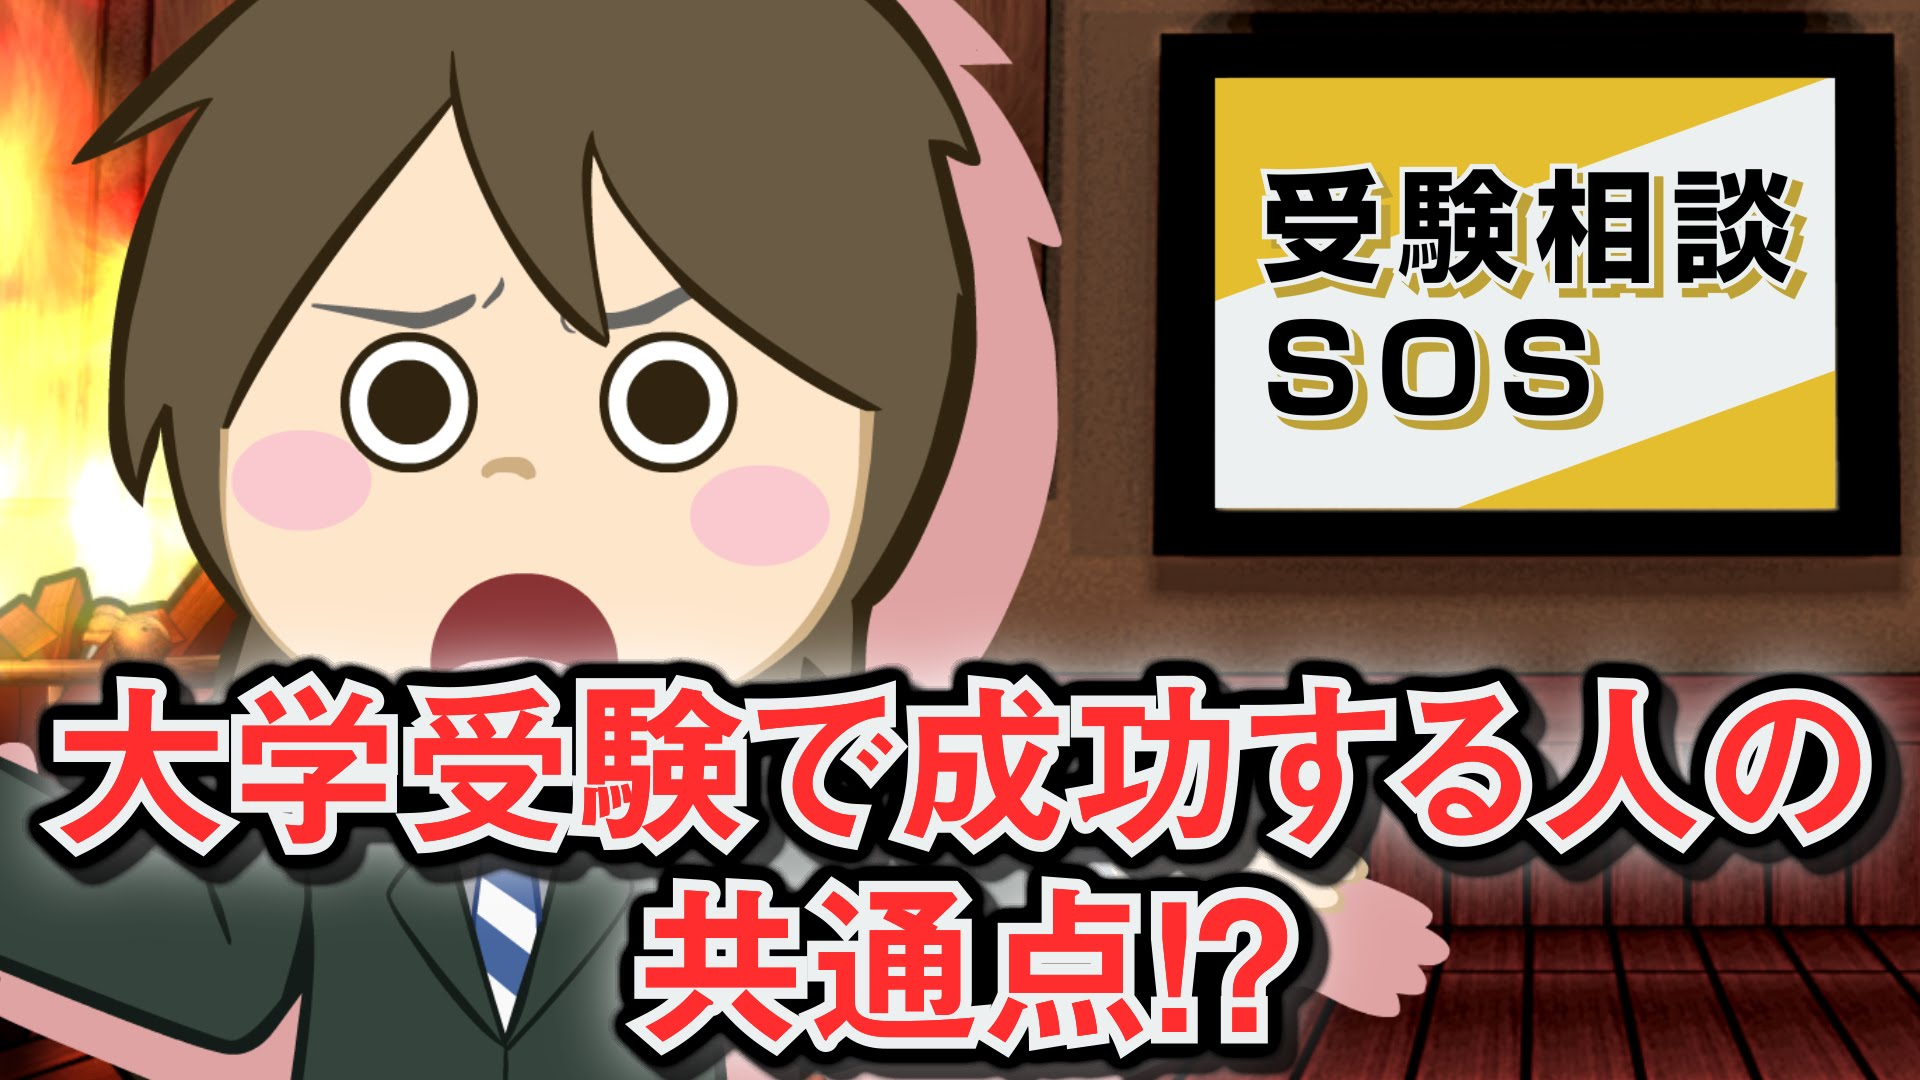 【vol.48】大学受験で成功する人の共通点!?|受験相談SOS